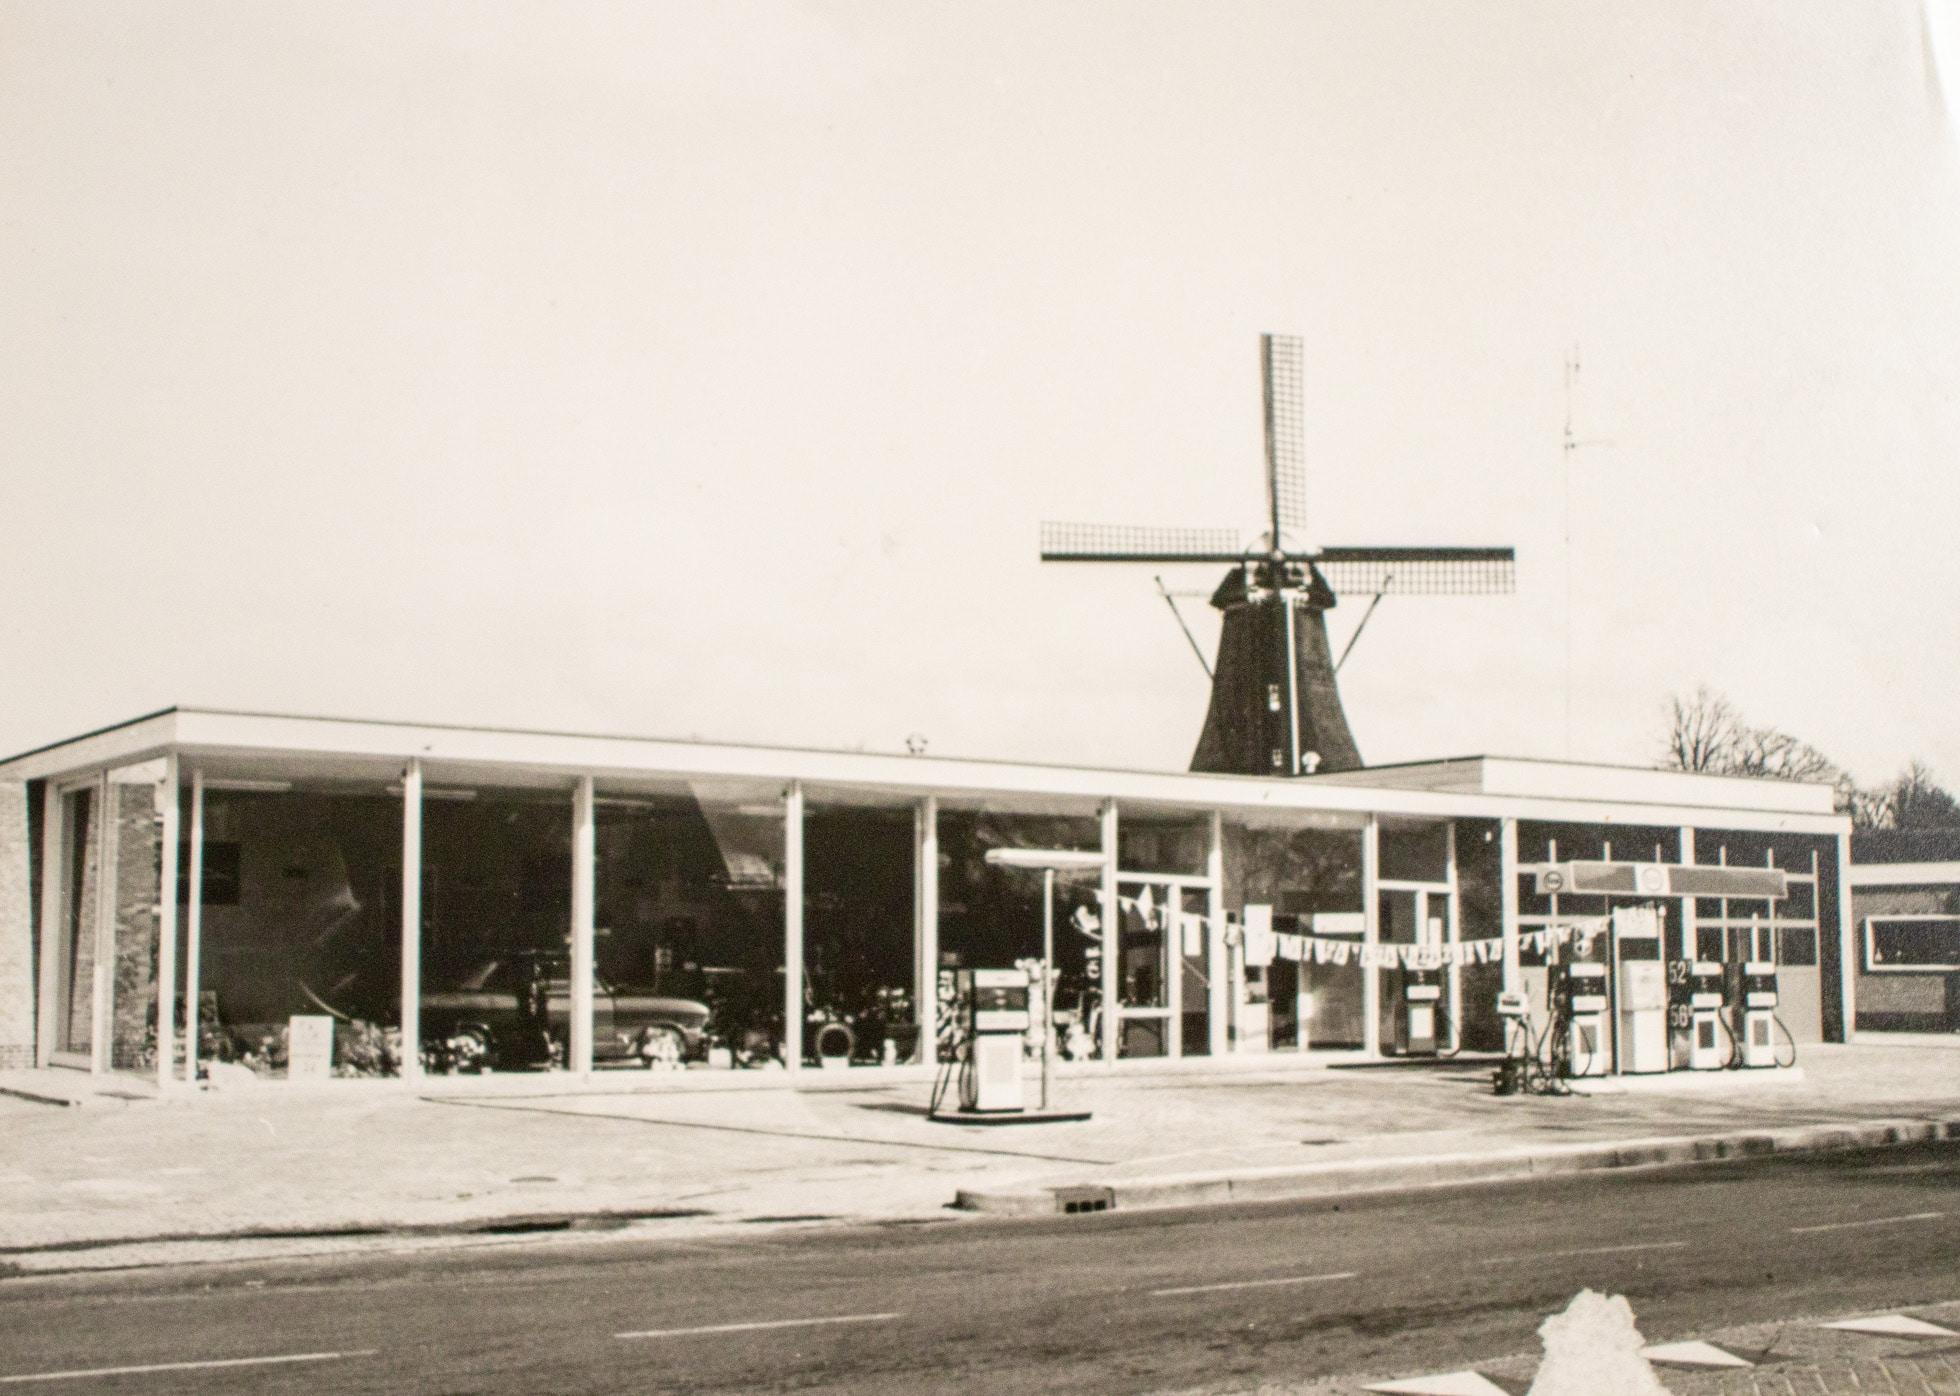 Garage-Dorenbos-Norg-Drenthe-historie-6835